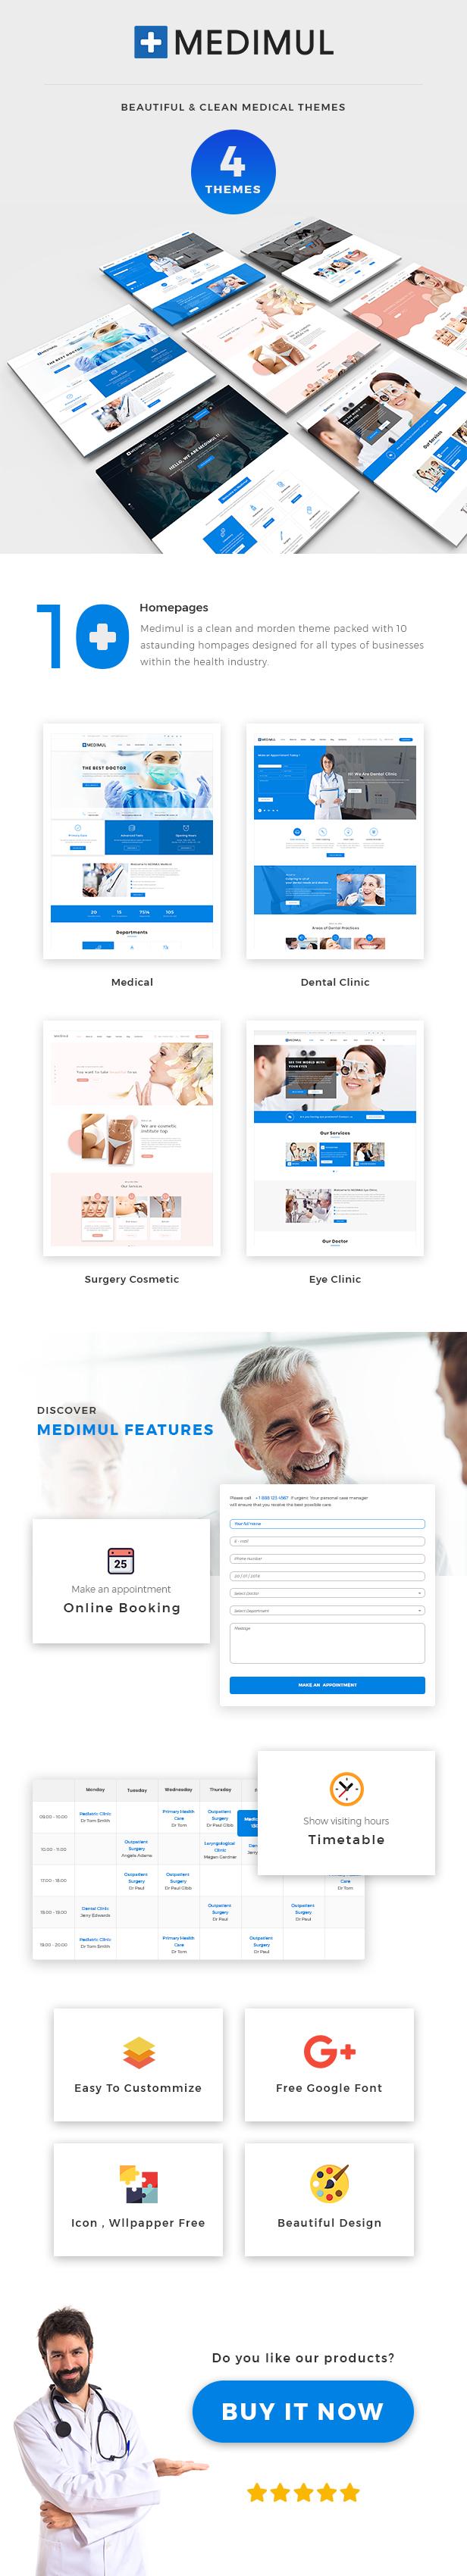 Medimul - Multi-Purpose Medical Health WordPress Theme - 1